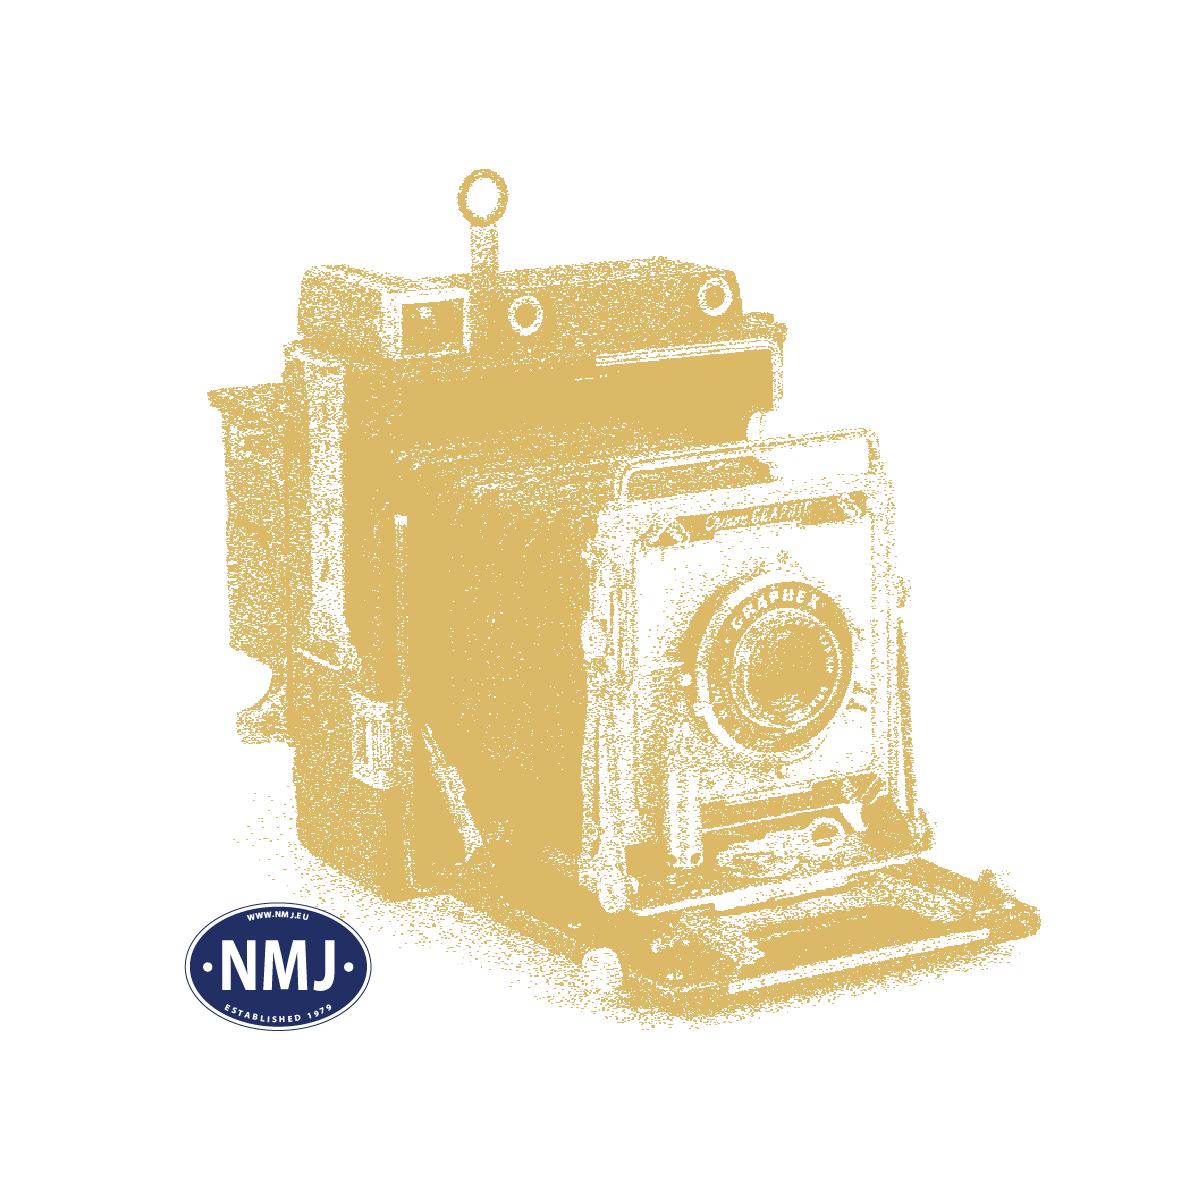 NMJT101.104 - NMJ Topline NSB WLABK 21081 Gammeldesign